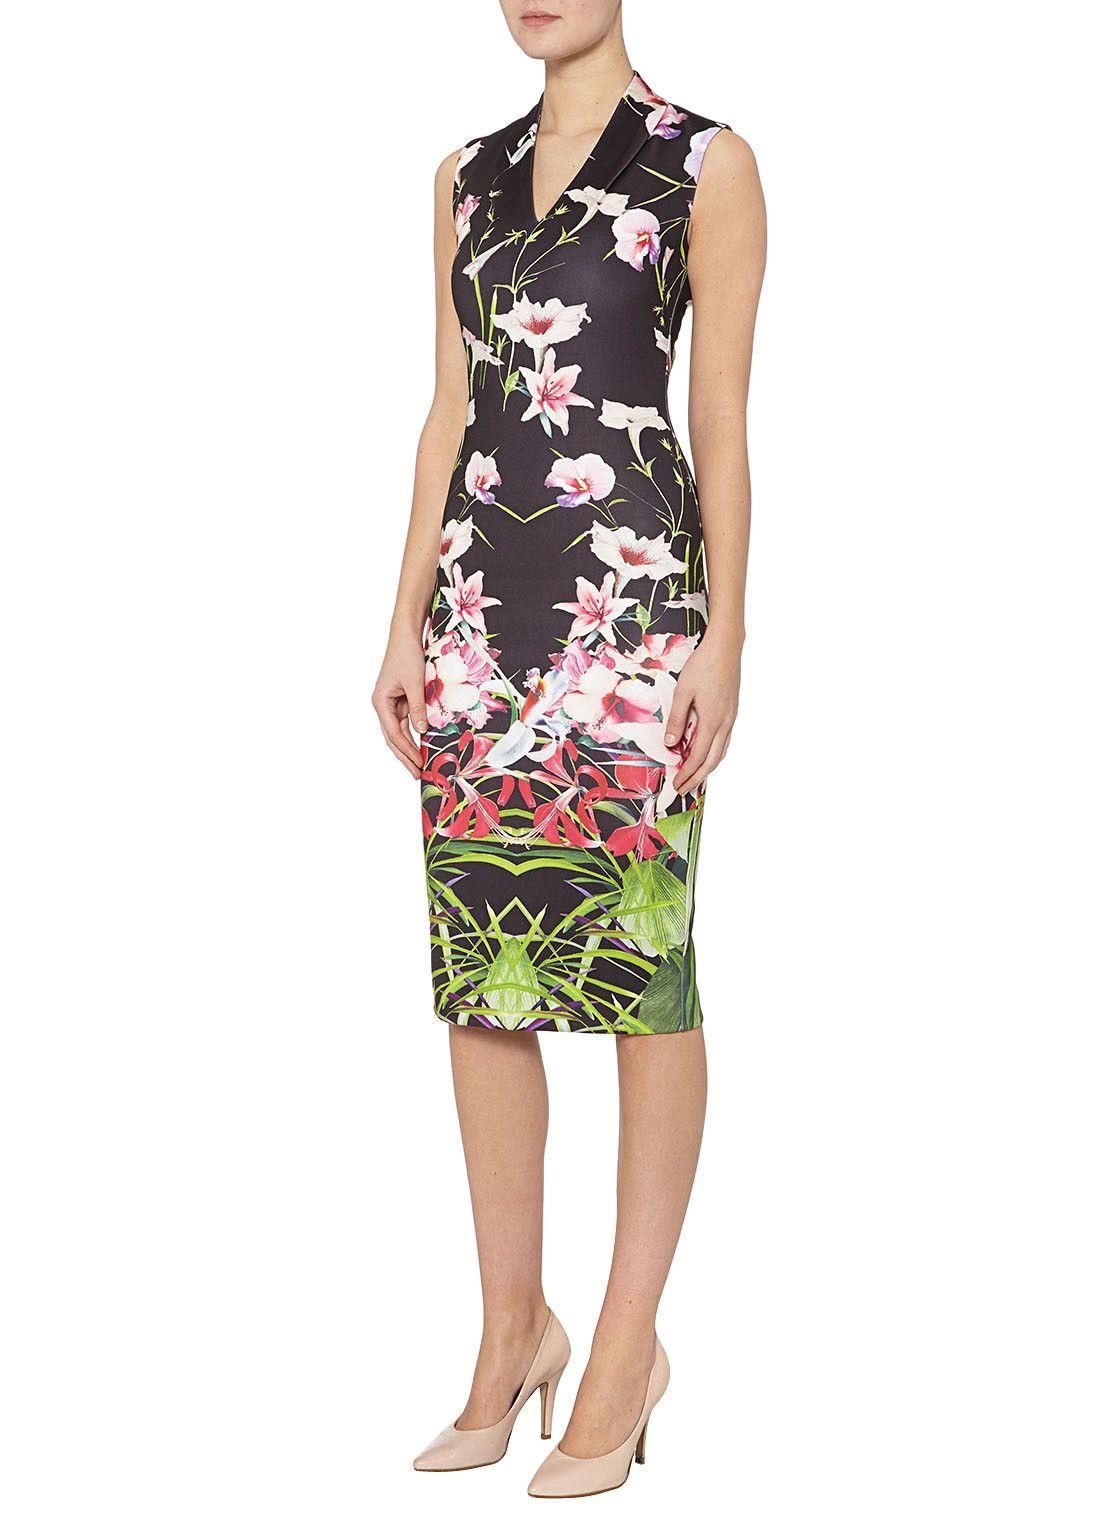 e0f3b3531eac4 Ted Baker Midi-jurk met bloemendessin • de Bijenkorf